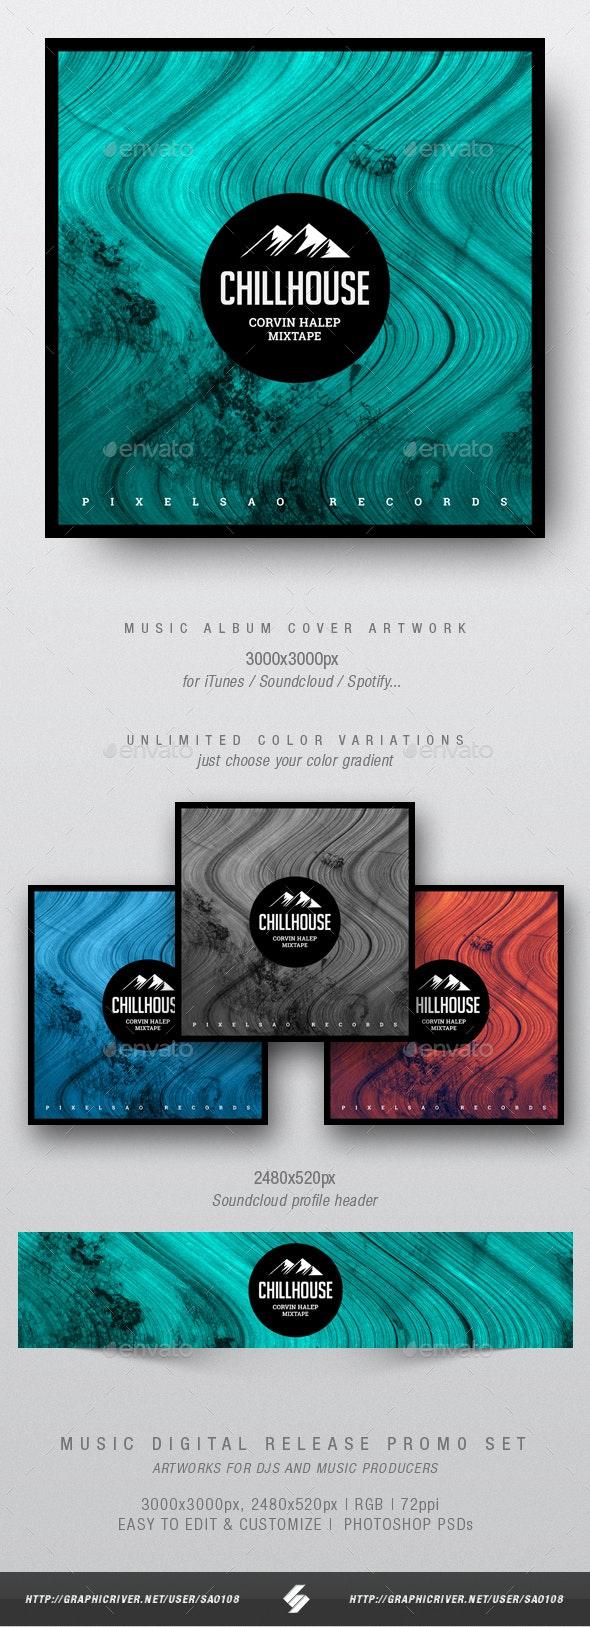 Chillhouse - Music Album Cover Artwork Template - Miscellaneous Social Media